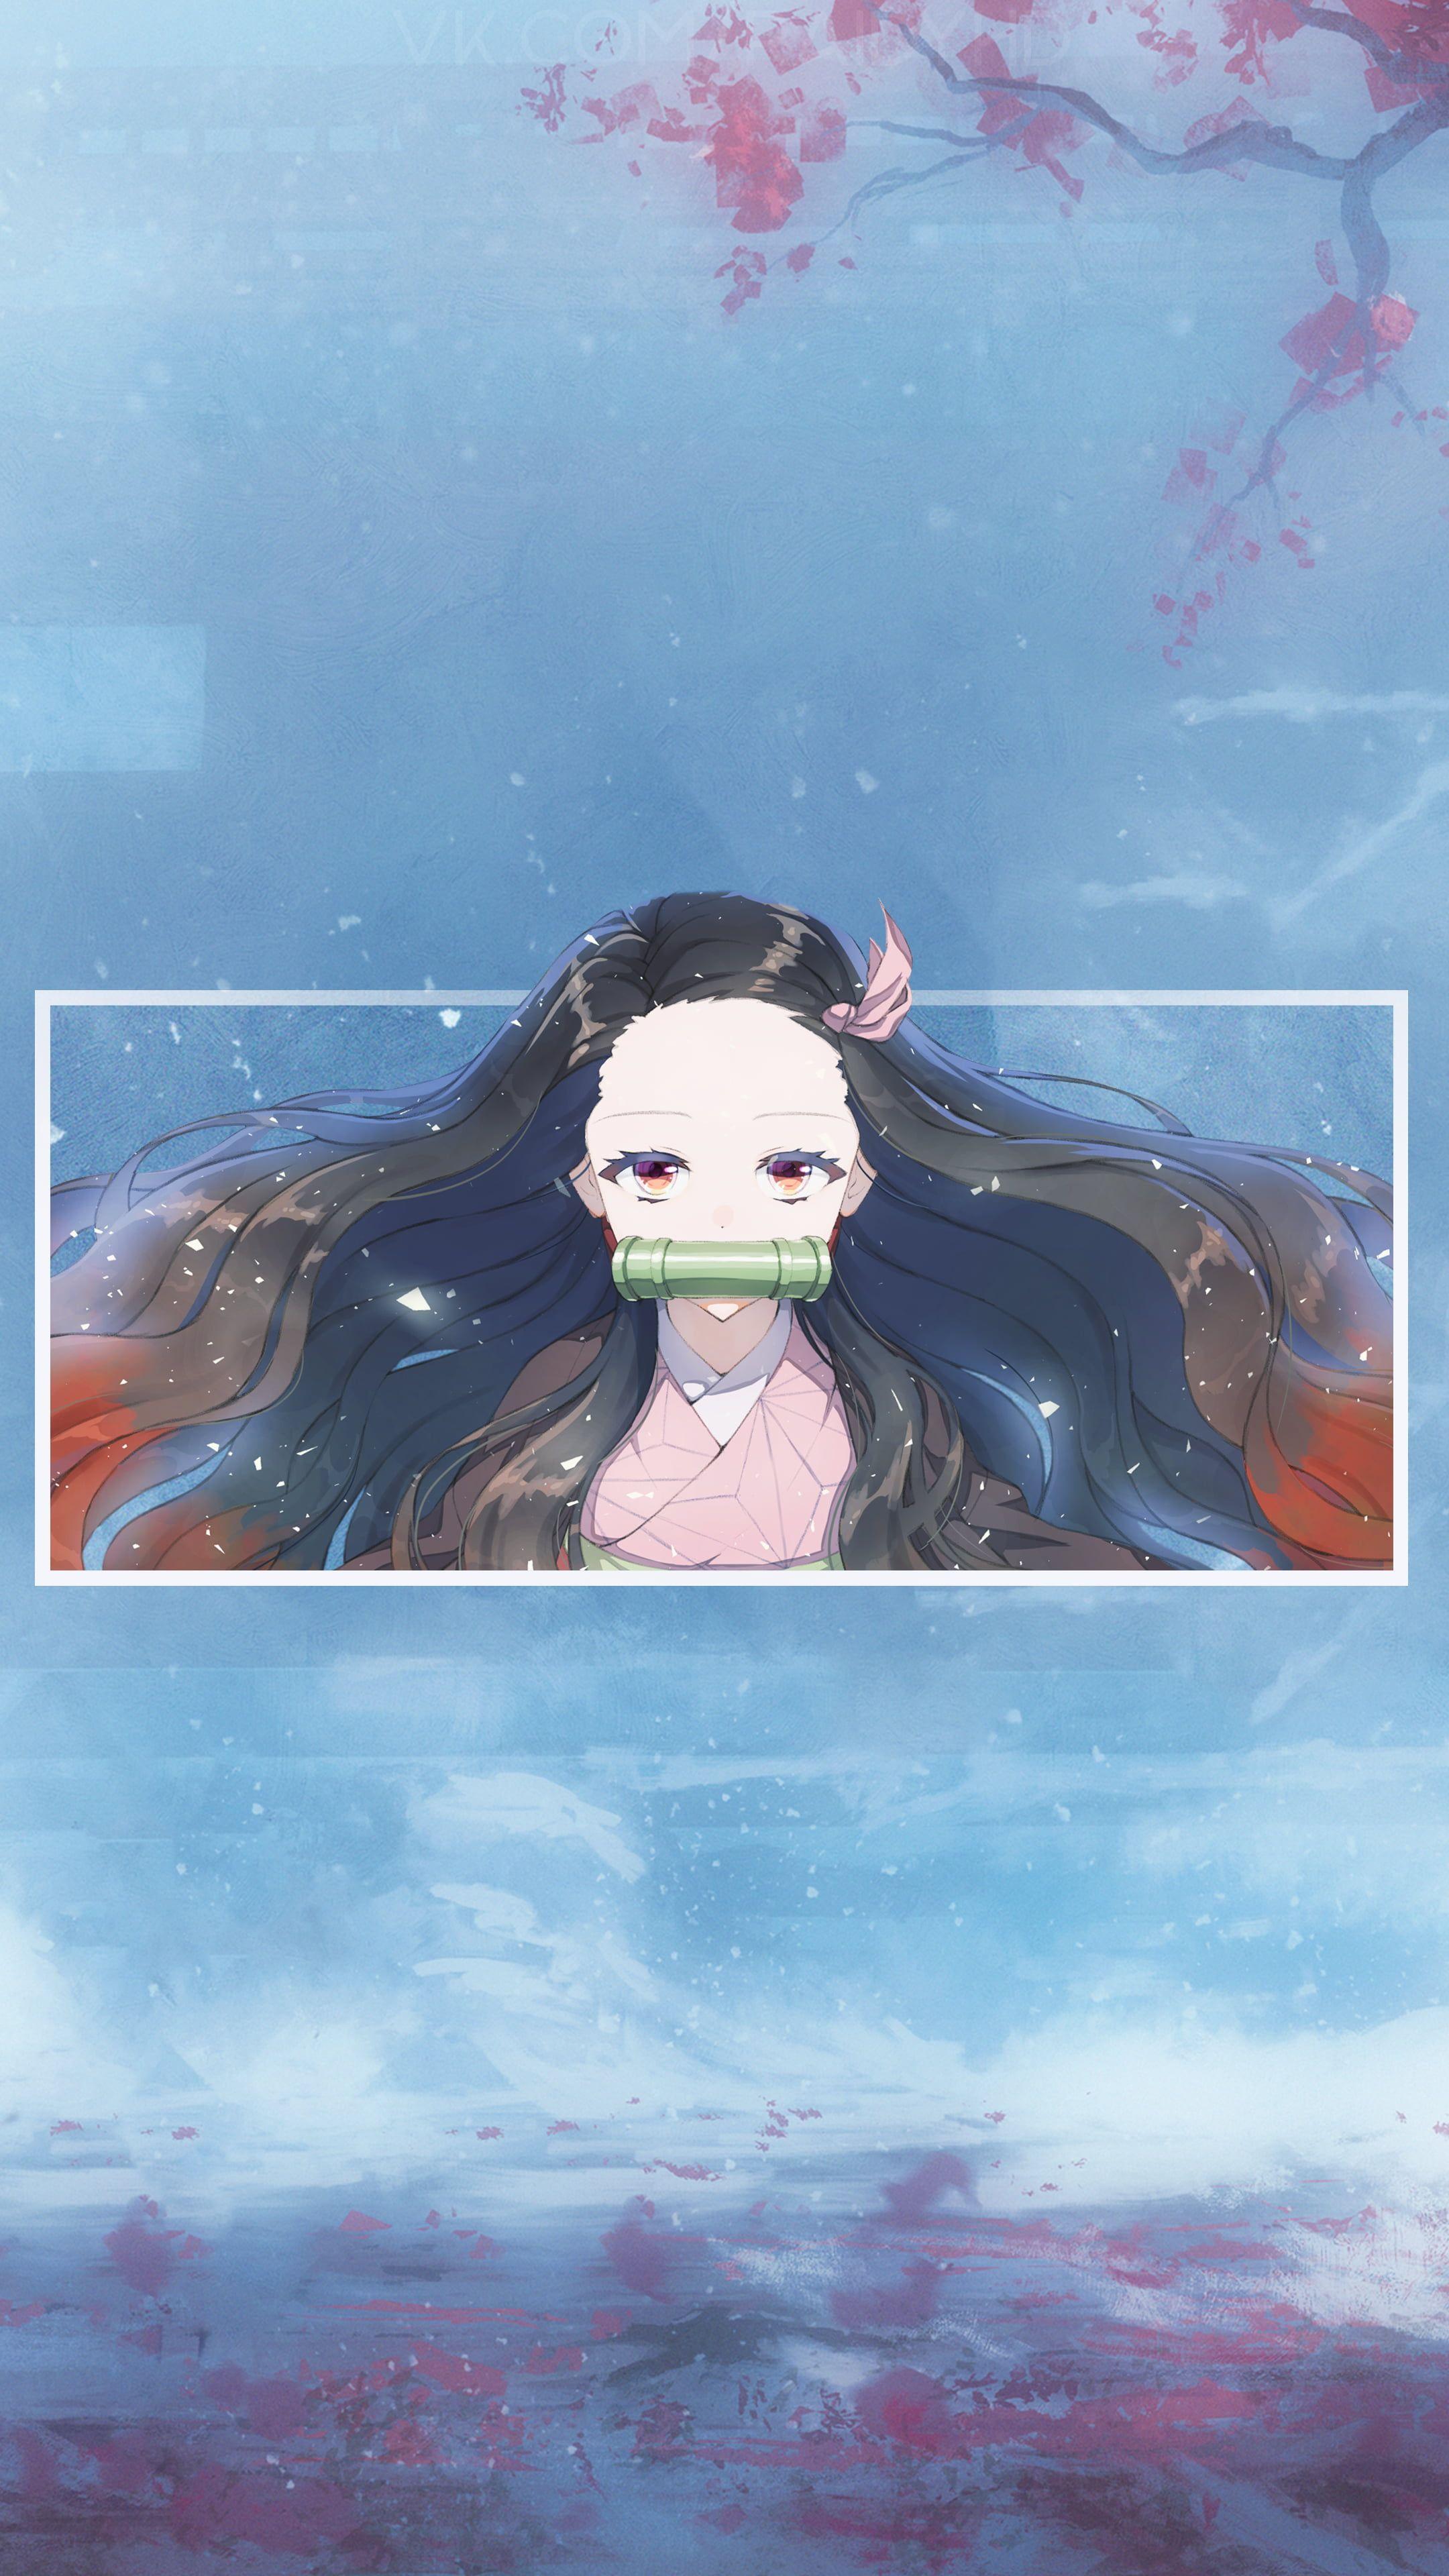 #anime anime girls #picture-in-picture #Nezuko Kimetsu no Yaiba #4K #wallpaper #hdwallpaper #desktop